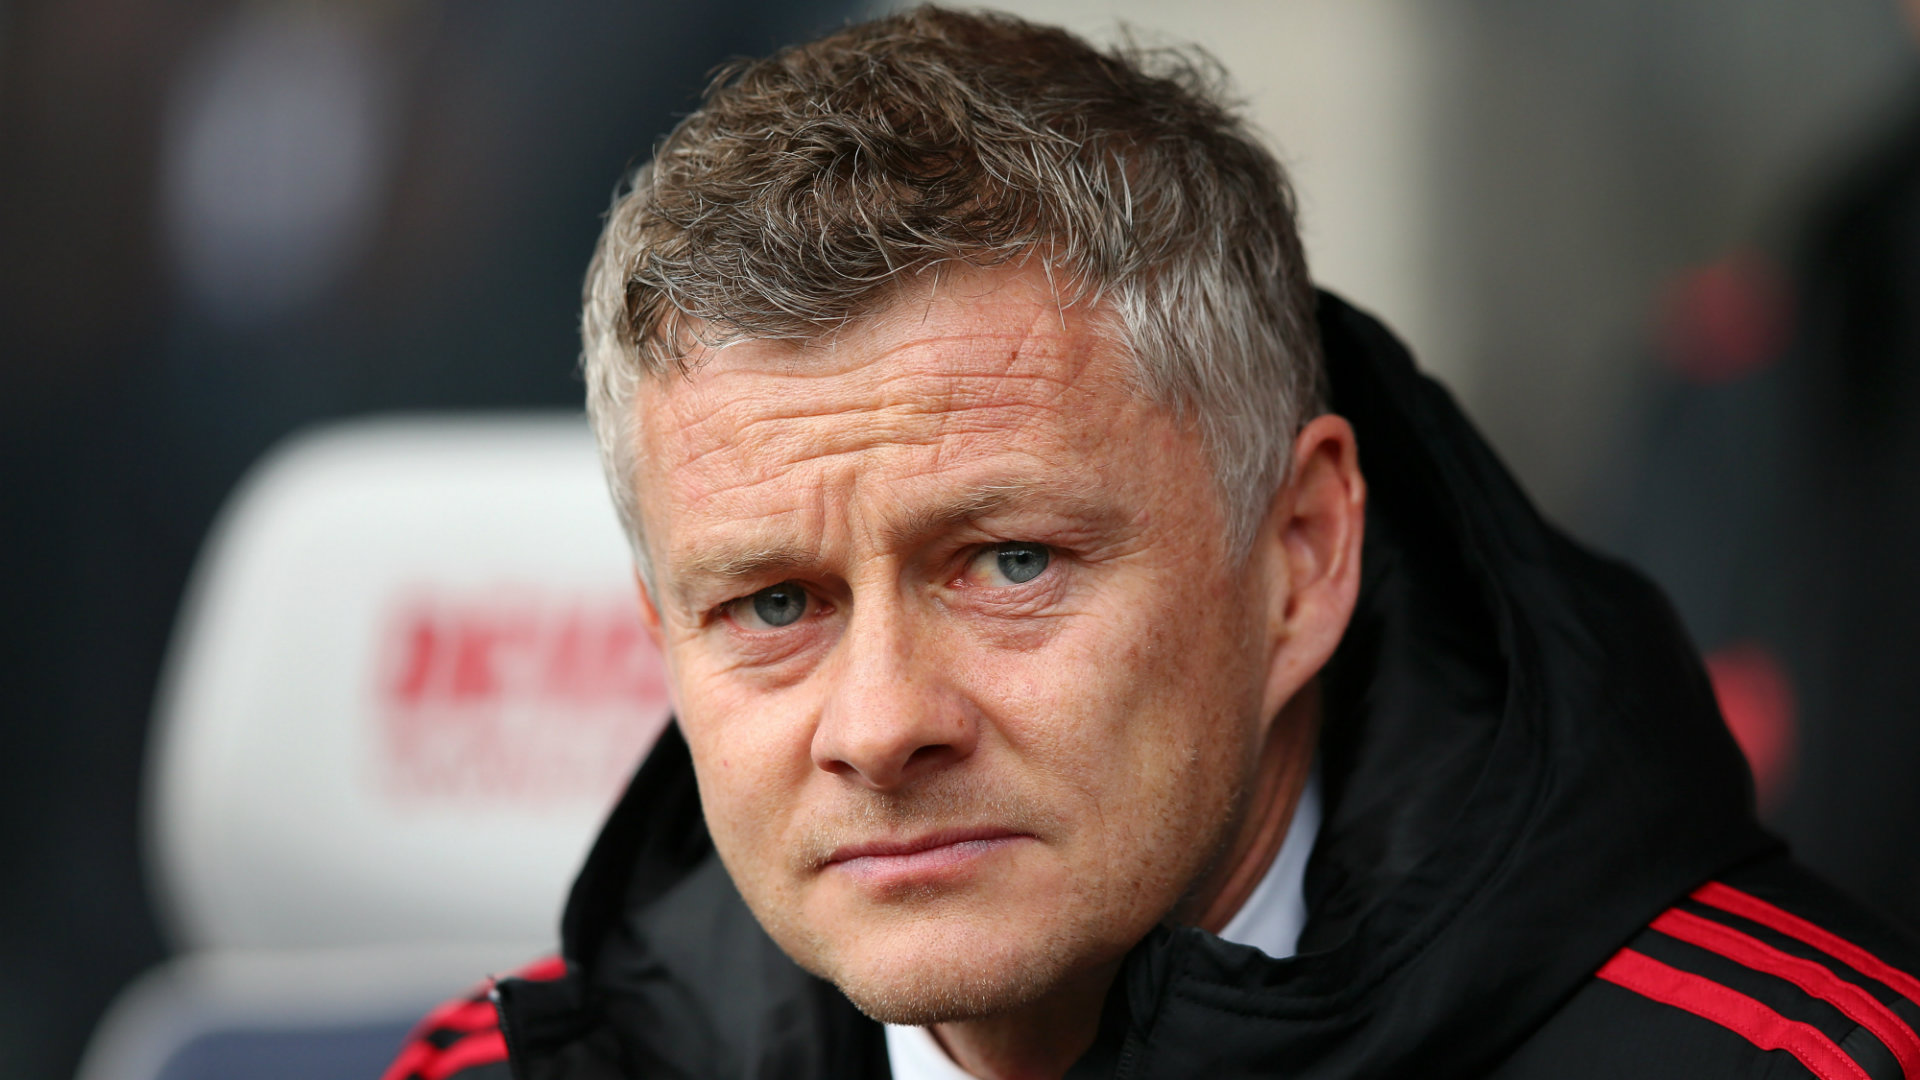 Ole Gunnar Solskjaer Huddersfield vs Man Utd Premier League 2018-19